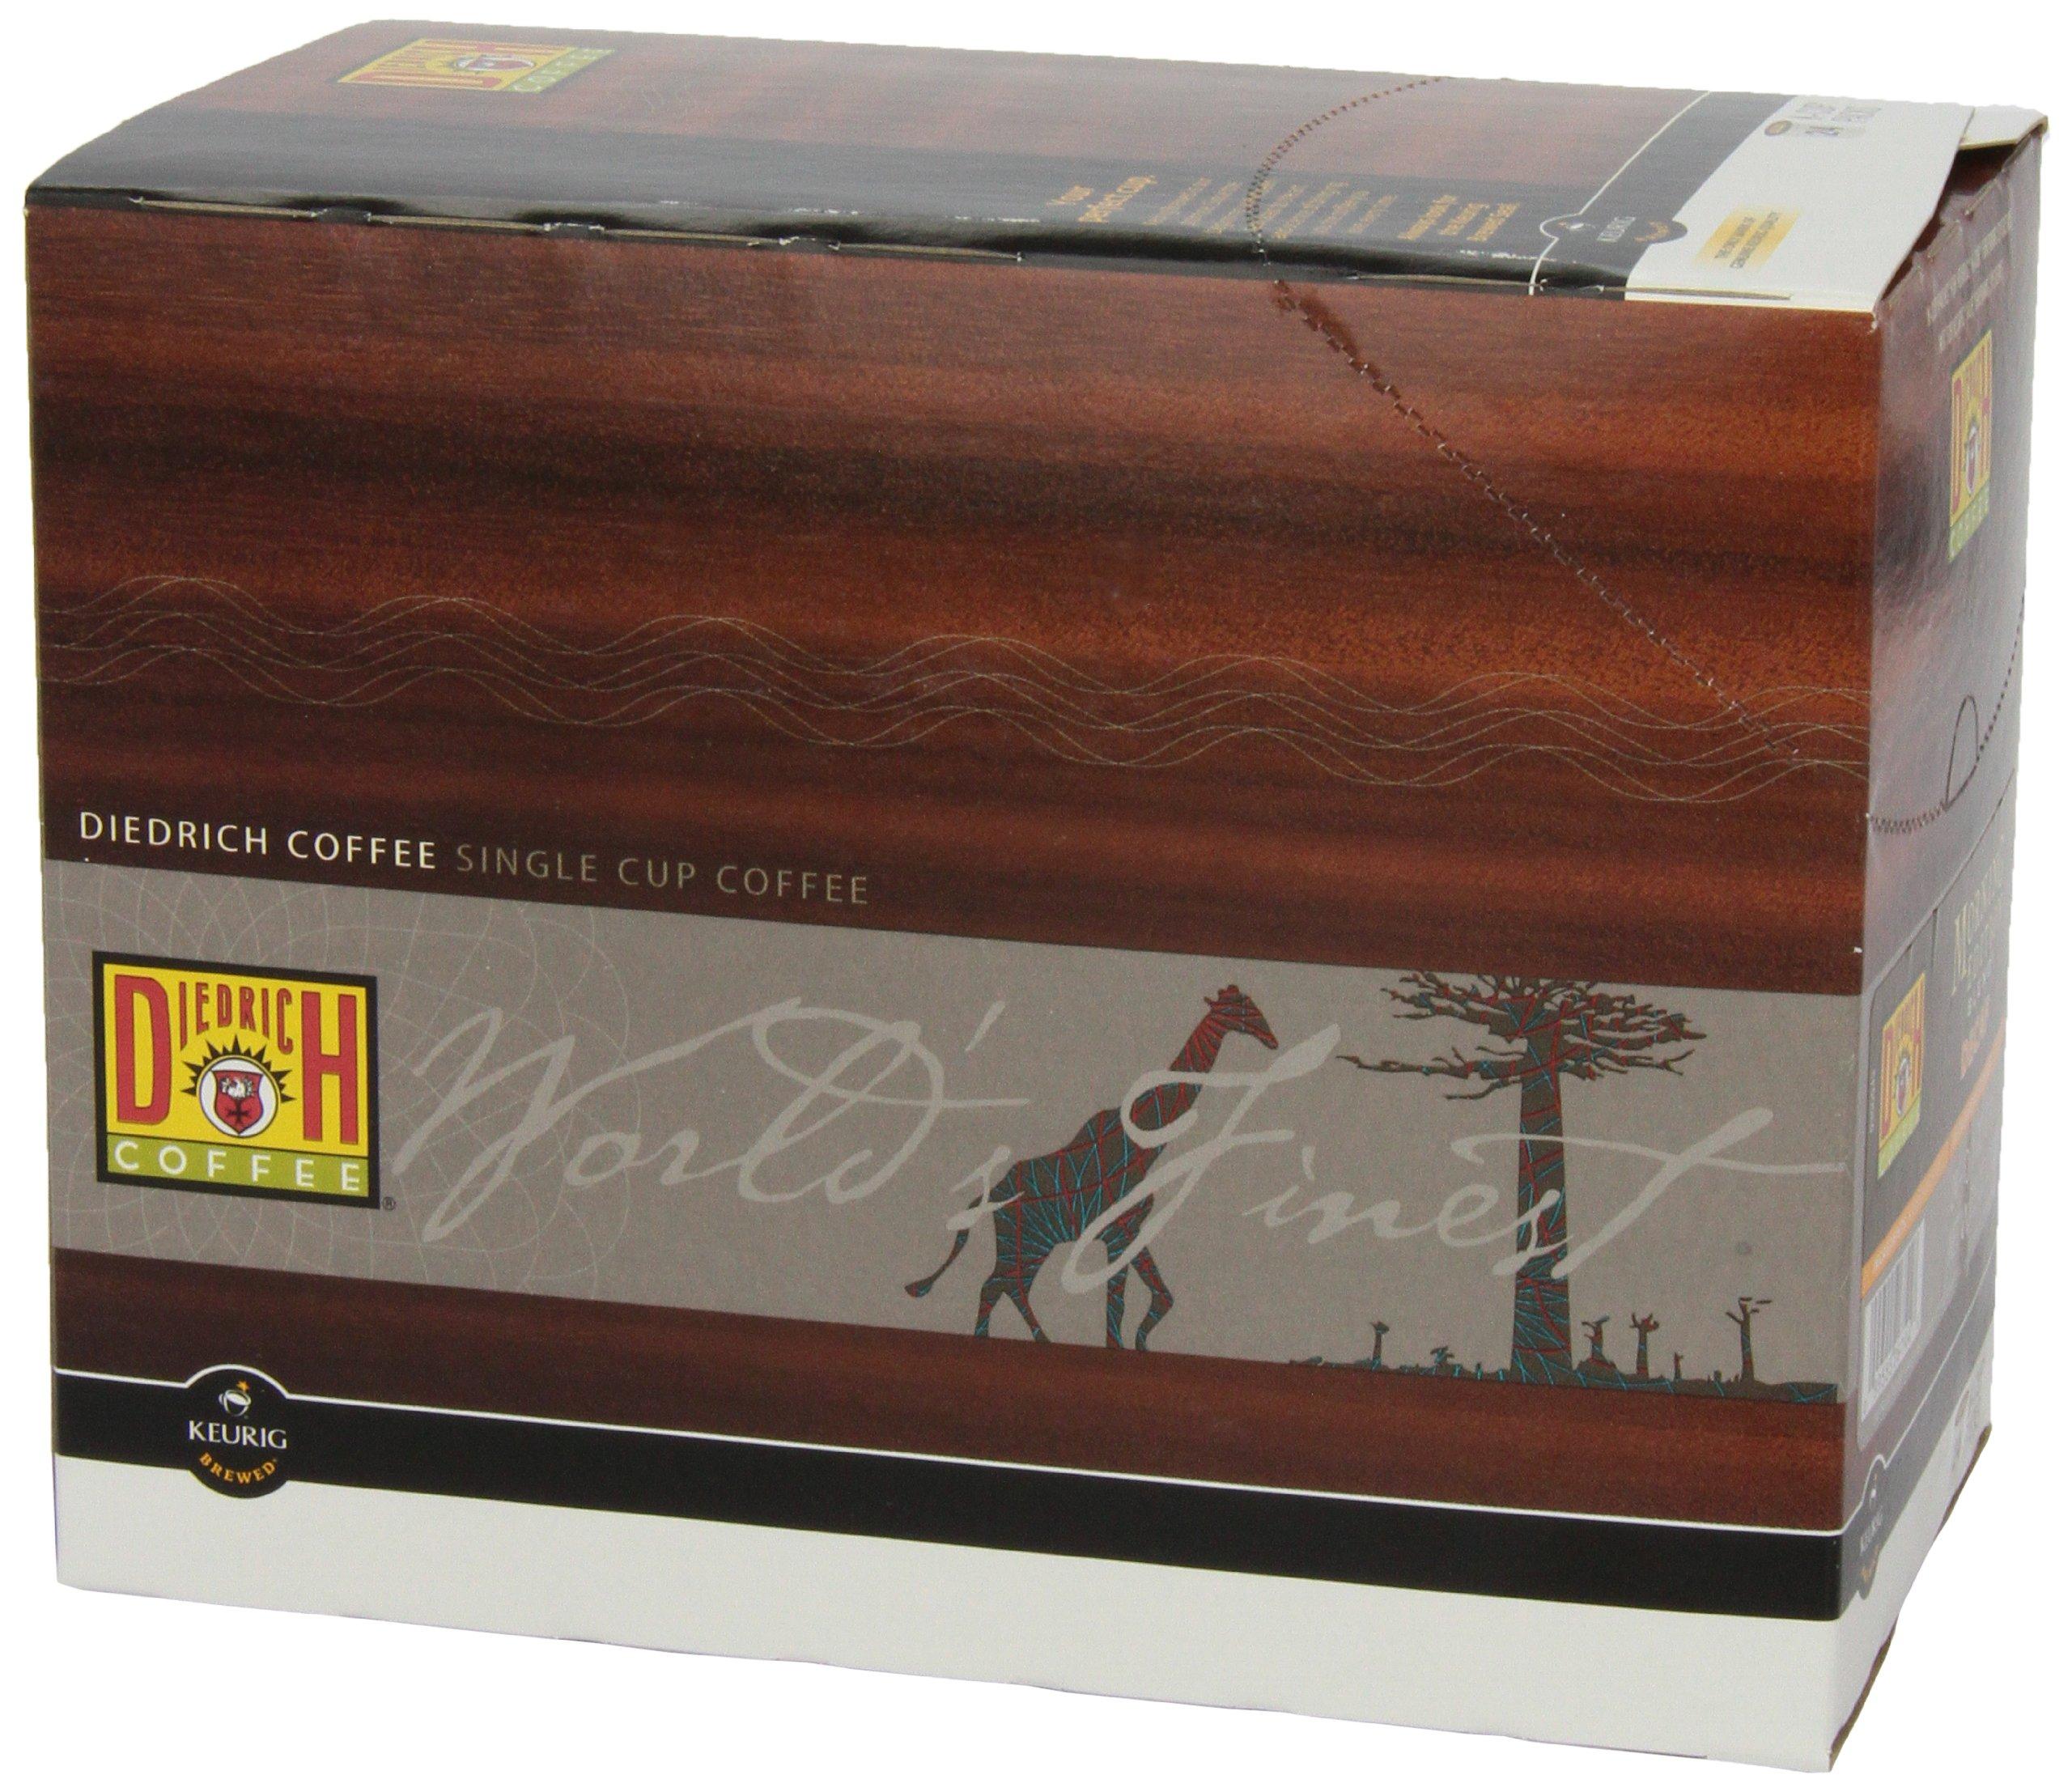 Diedrich Coffee K-Cup for Keurig Brewers, Medium Roast, Decaf, Morning Edition Blend (Pack of 96)